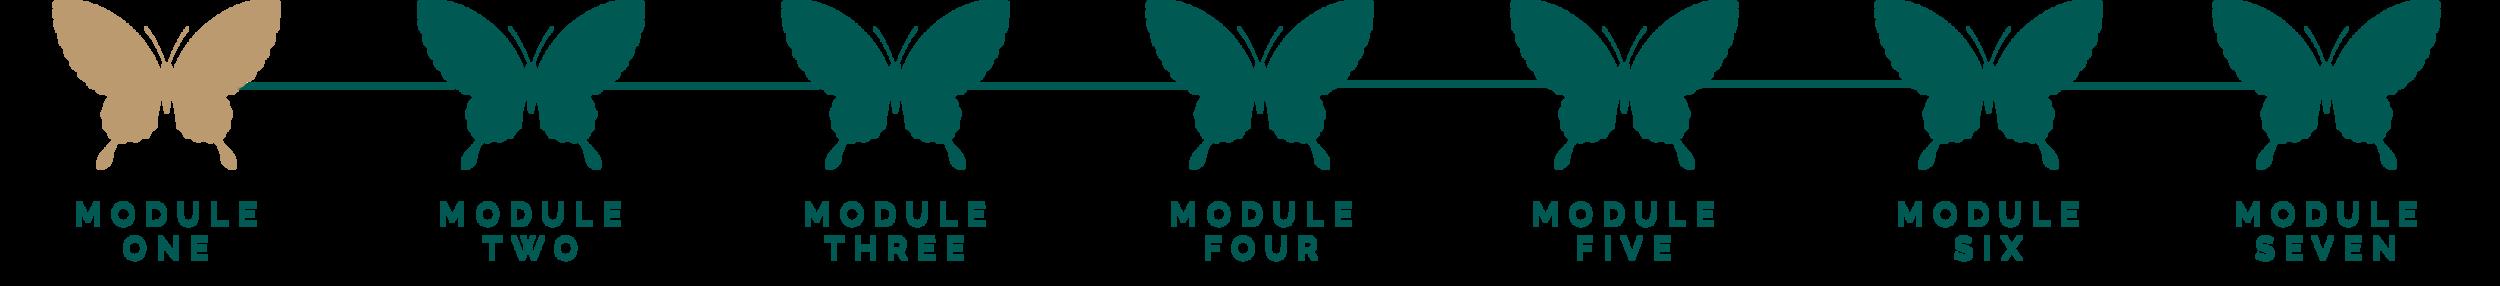 Module 1.7.png